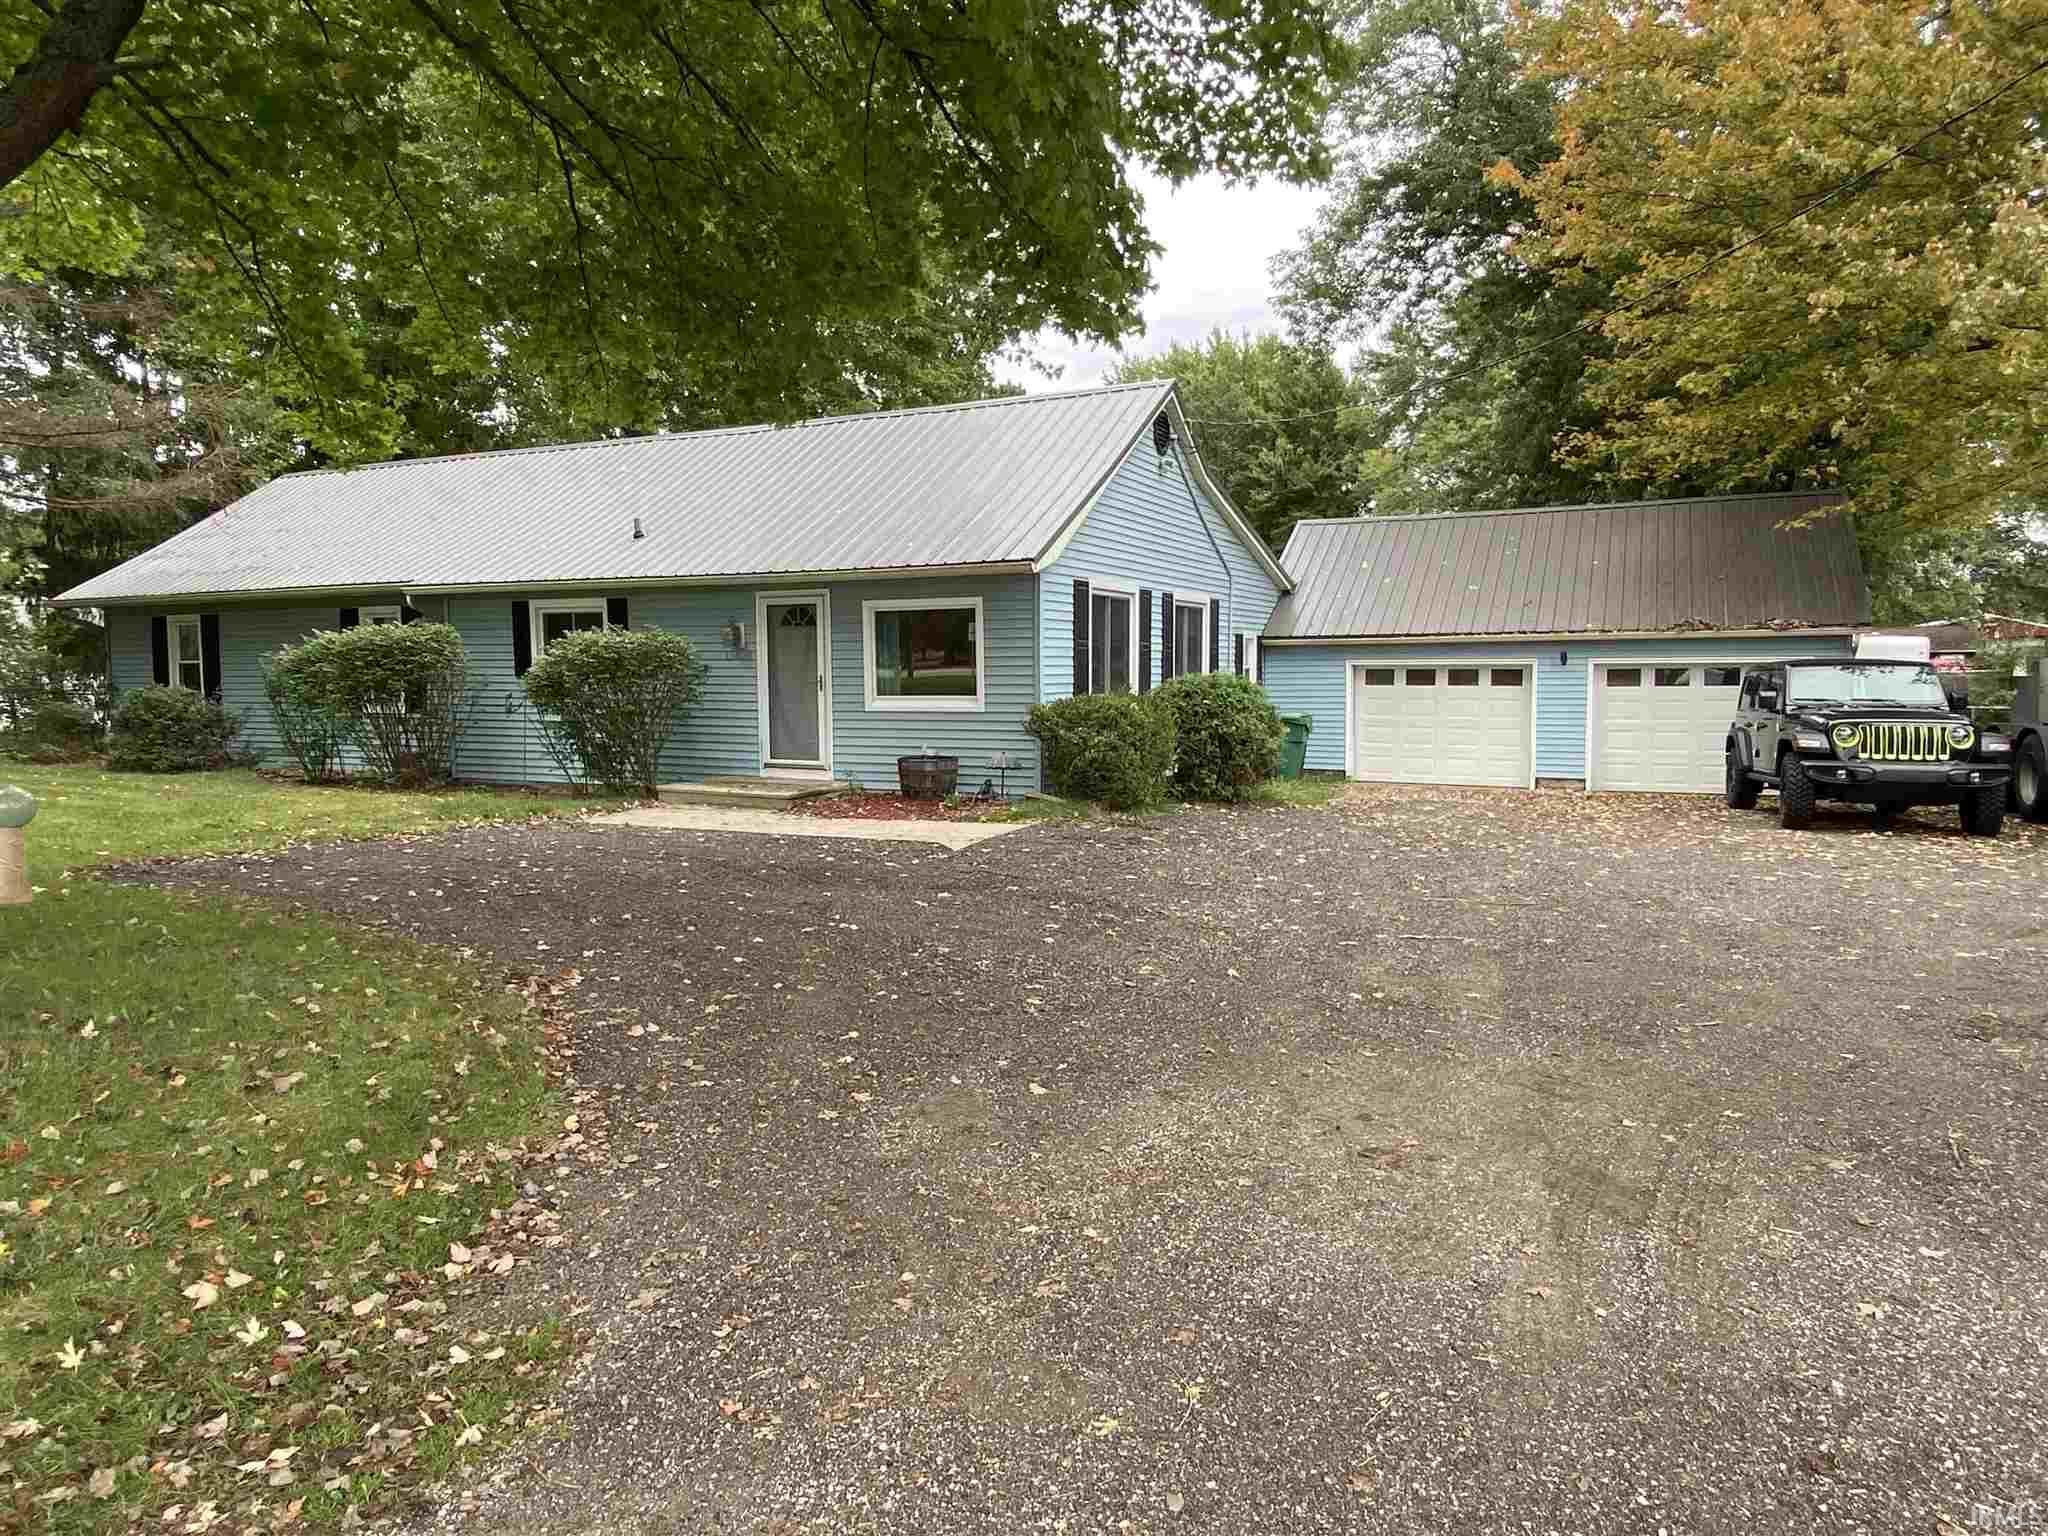 13620 State Road Granger, IN 46530